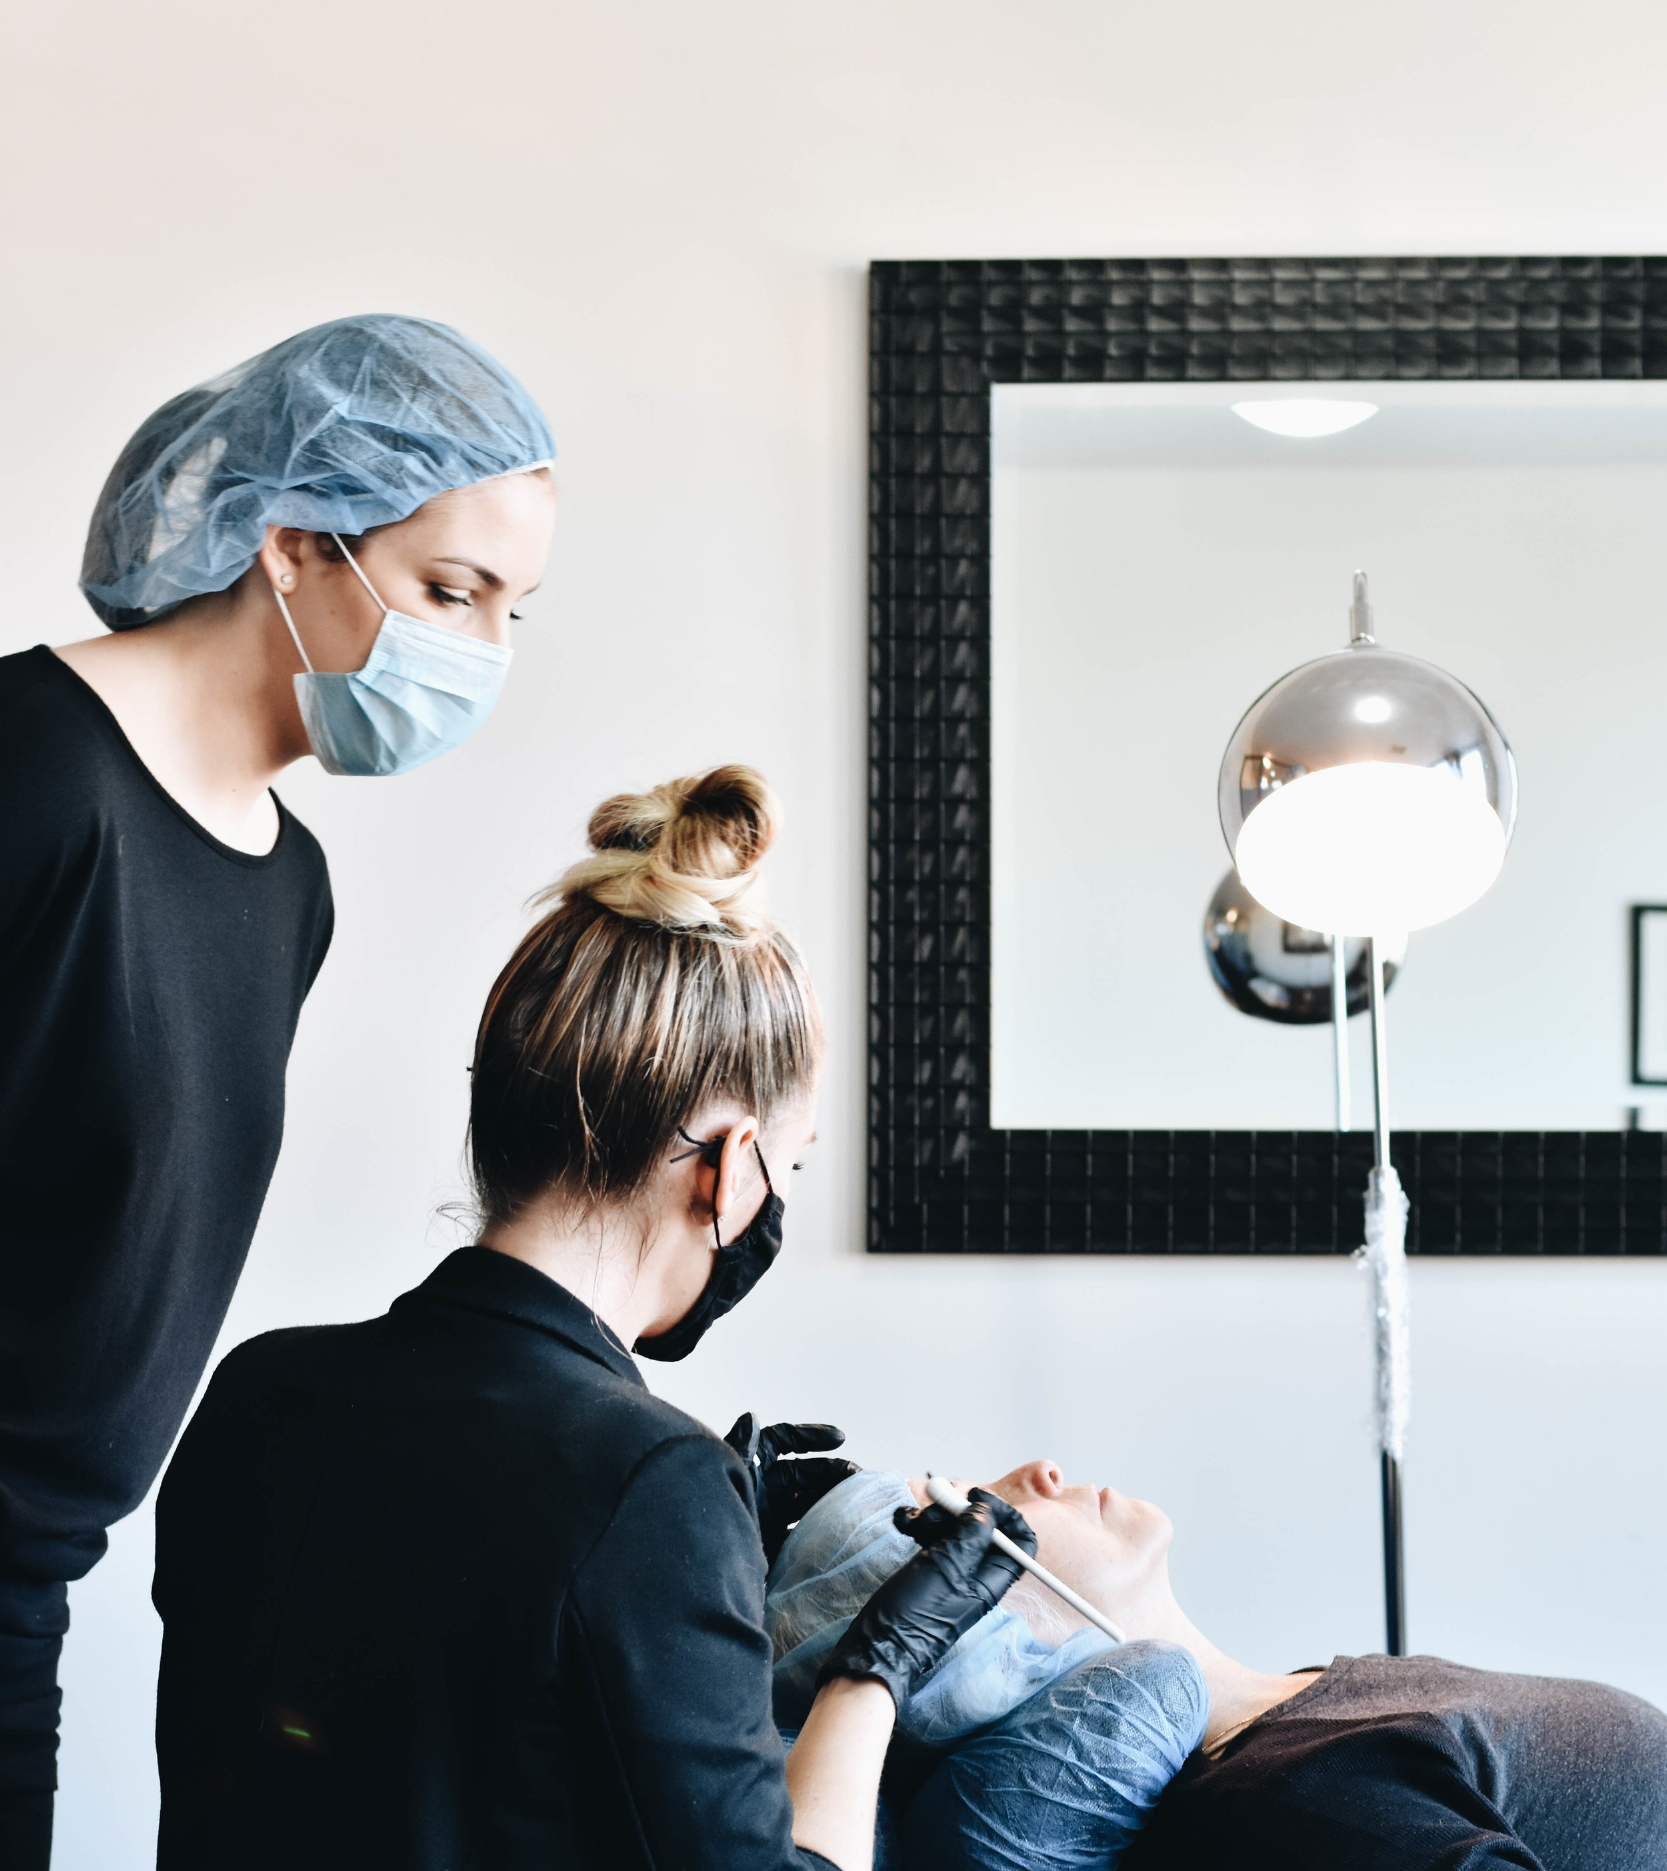 eyebrow-microblade-kelowna-training